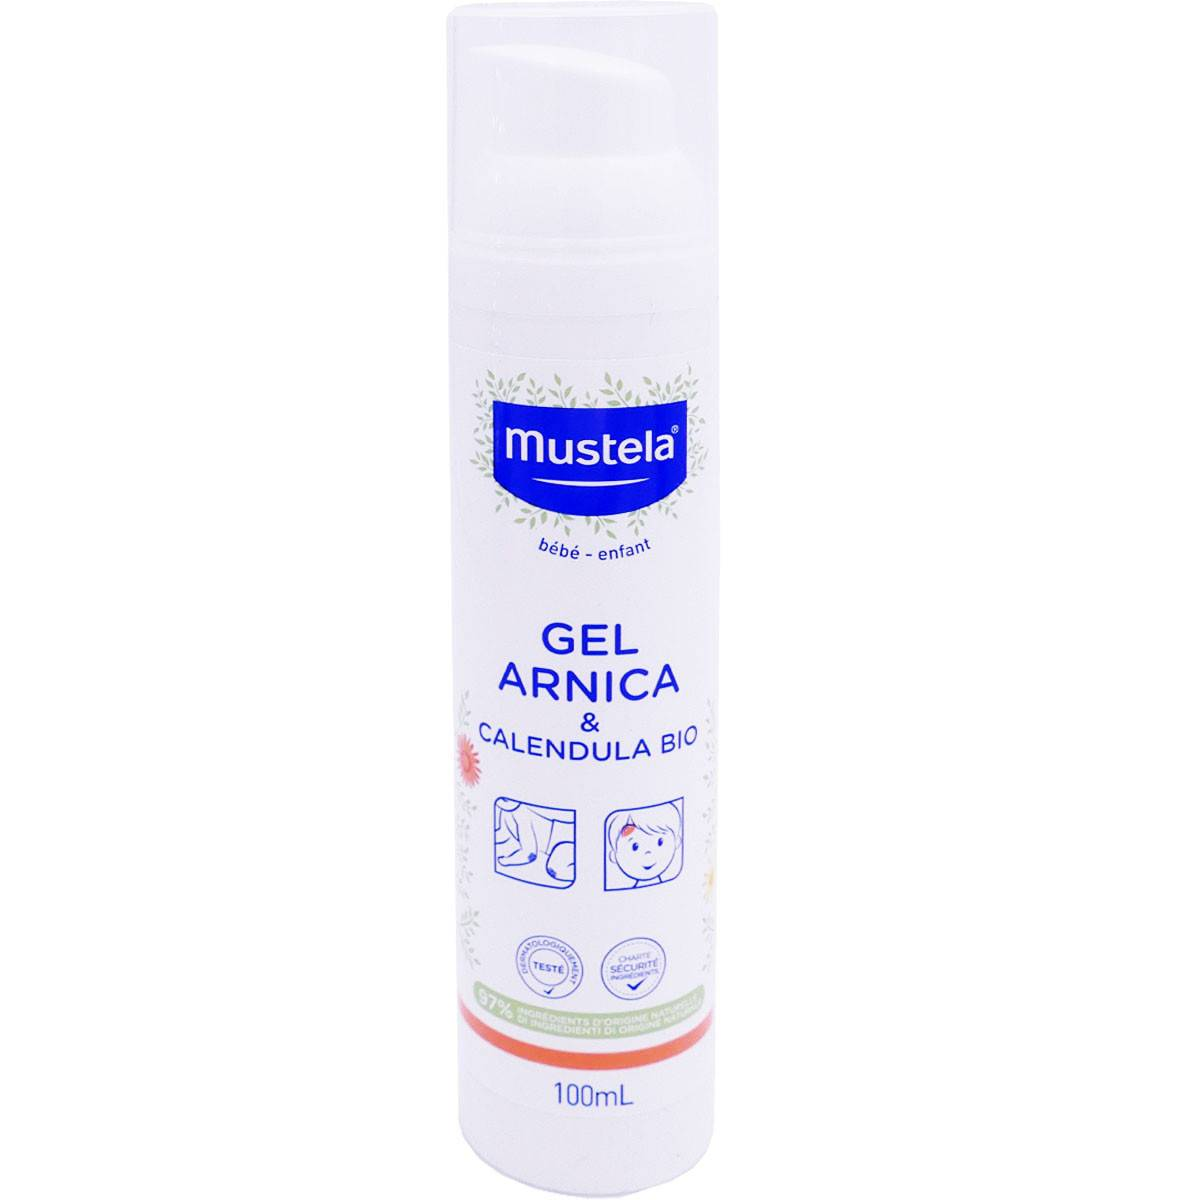 Mustela gel arnica & calendula bio 100 ml